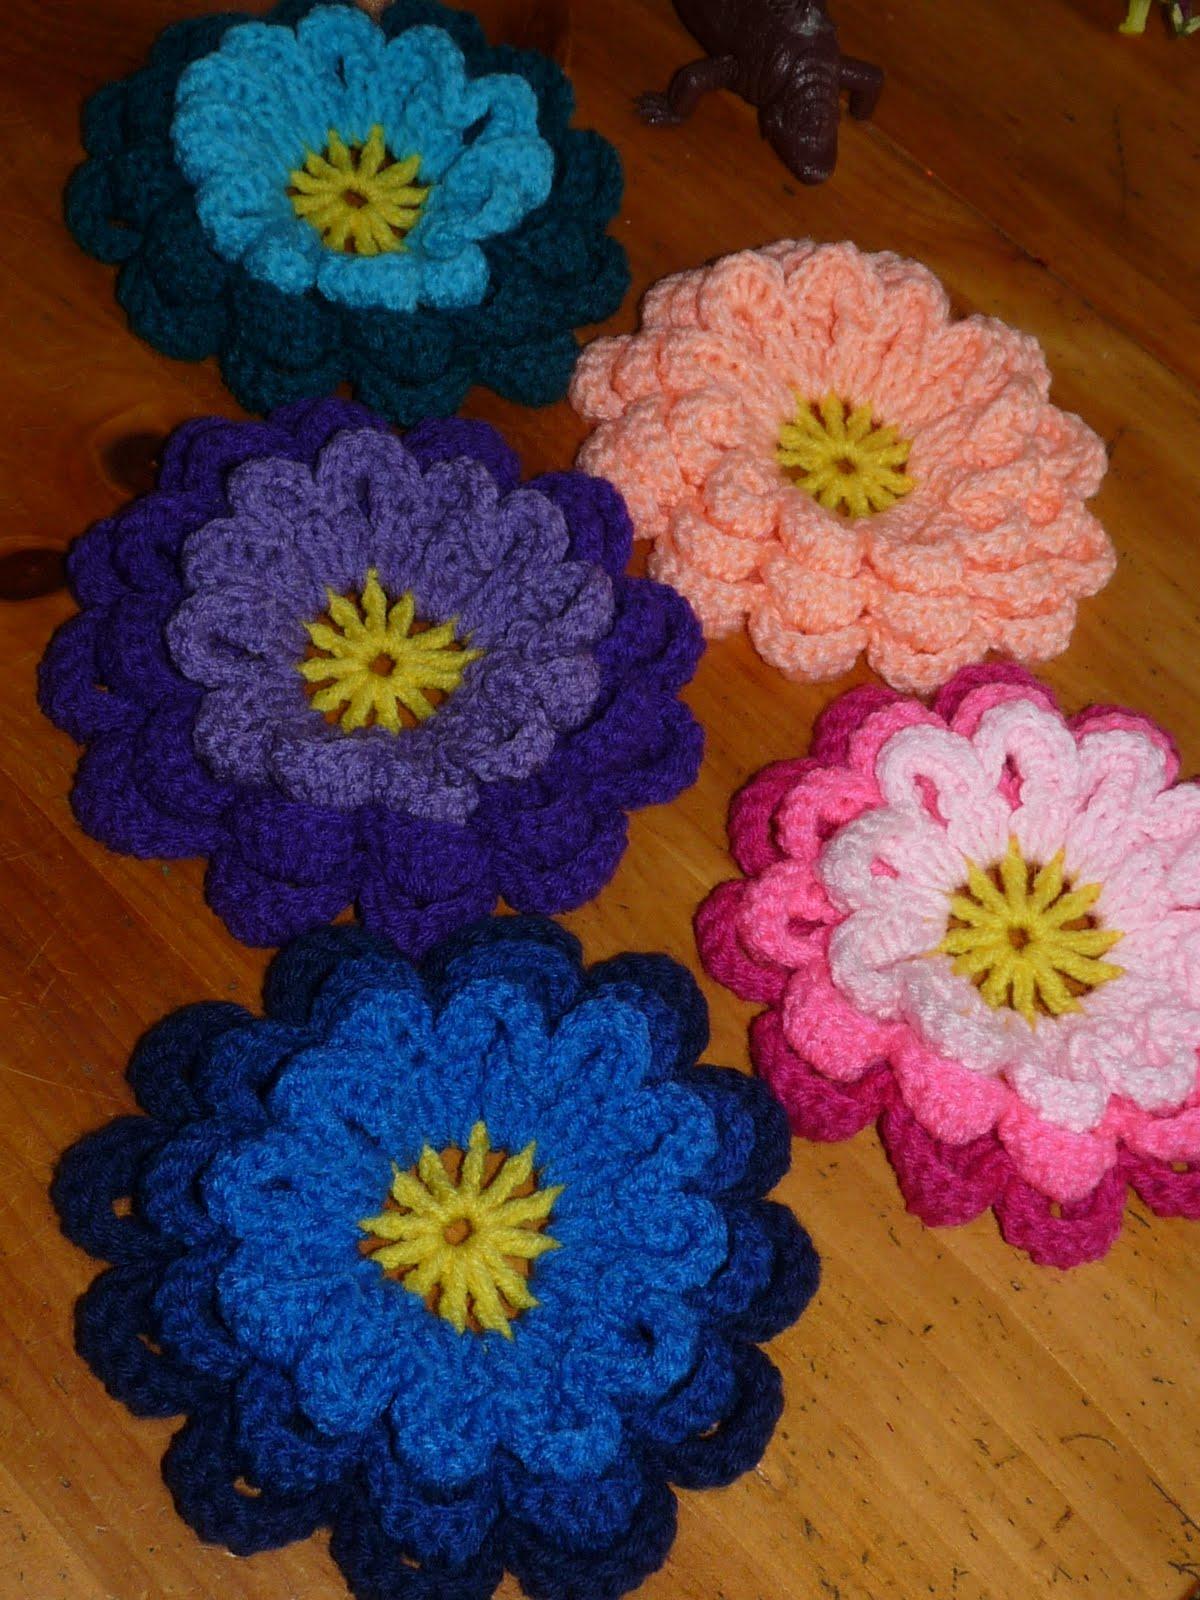 Nancys crochet 3 d flowers 3 d flowers izmirmasajfo Image collections